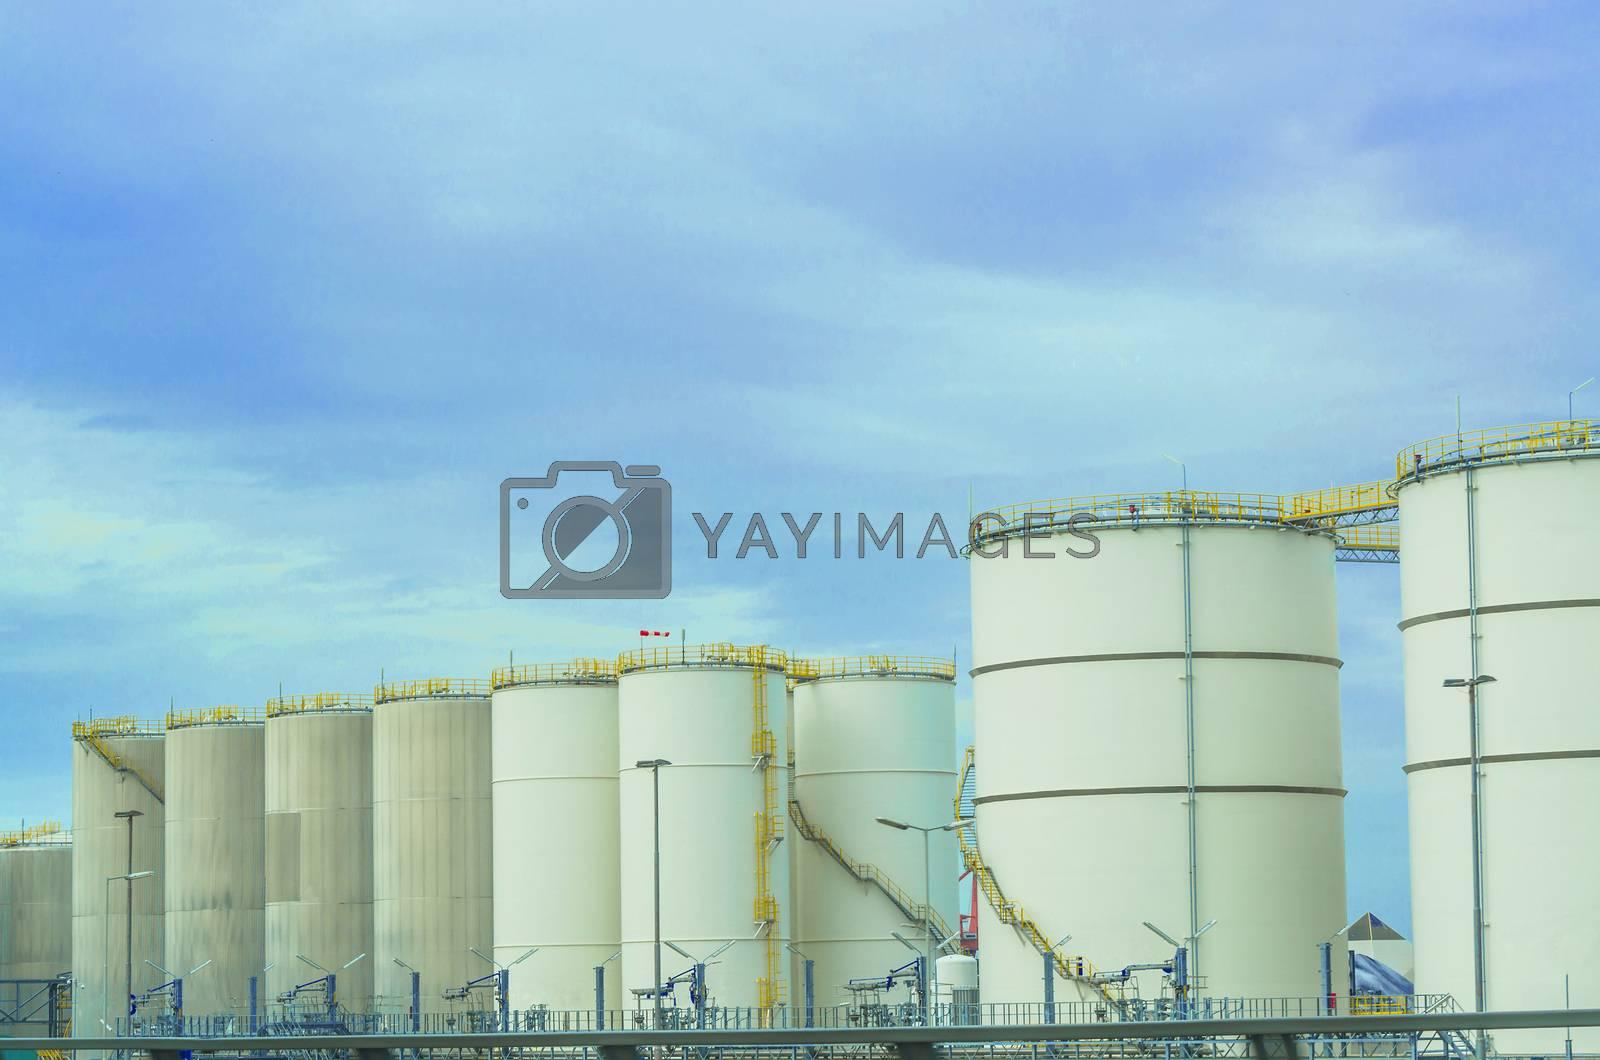 Industrial fuel Depos by JFsPic